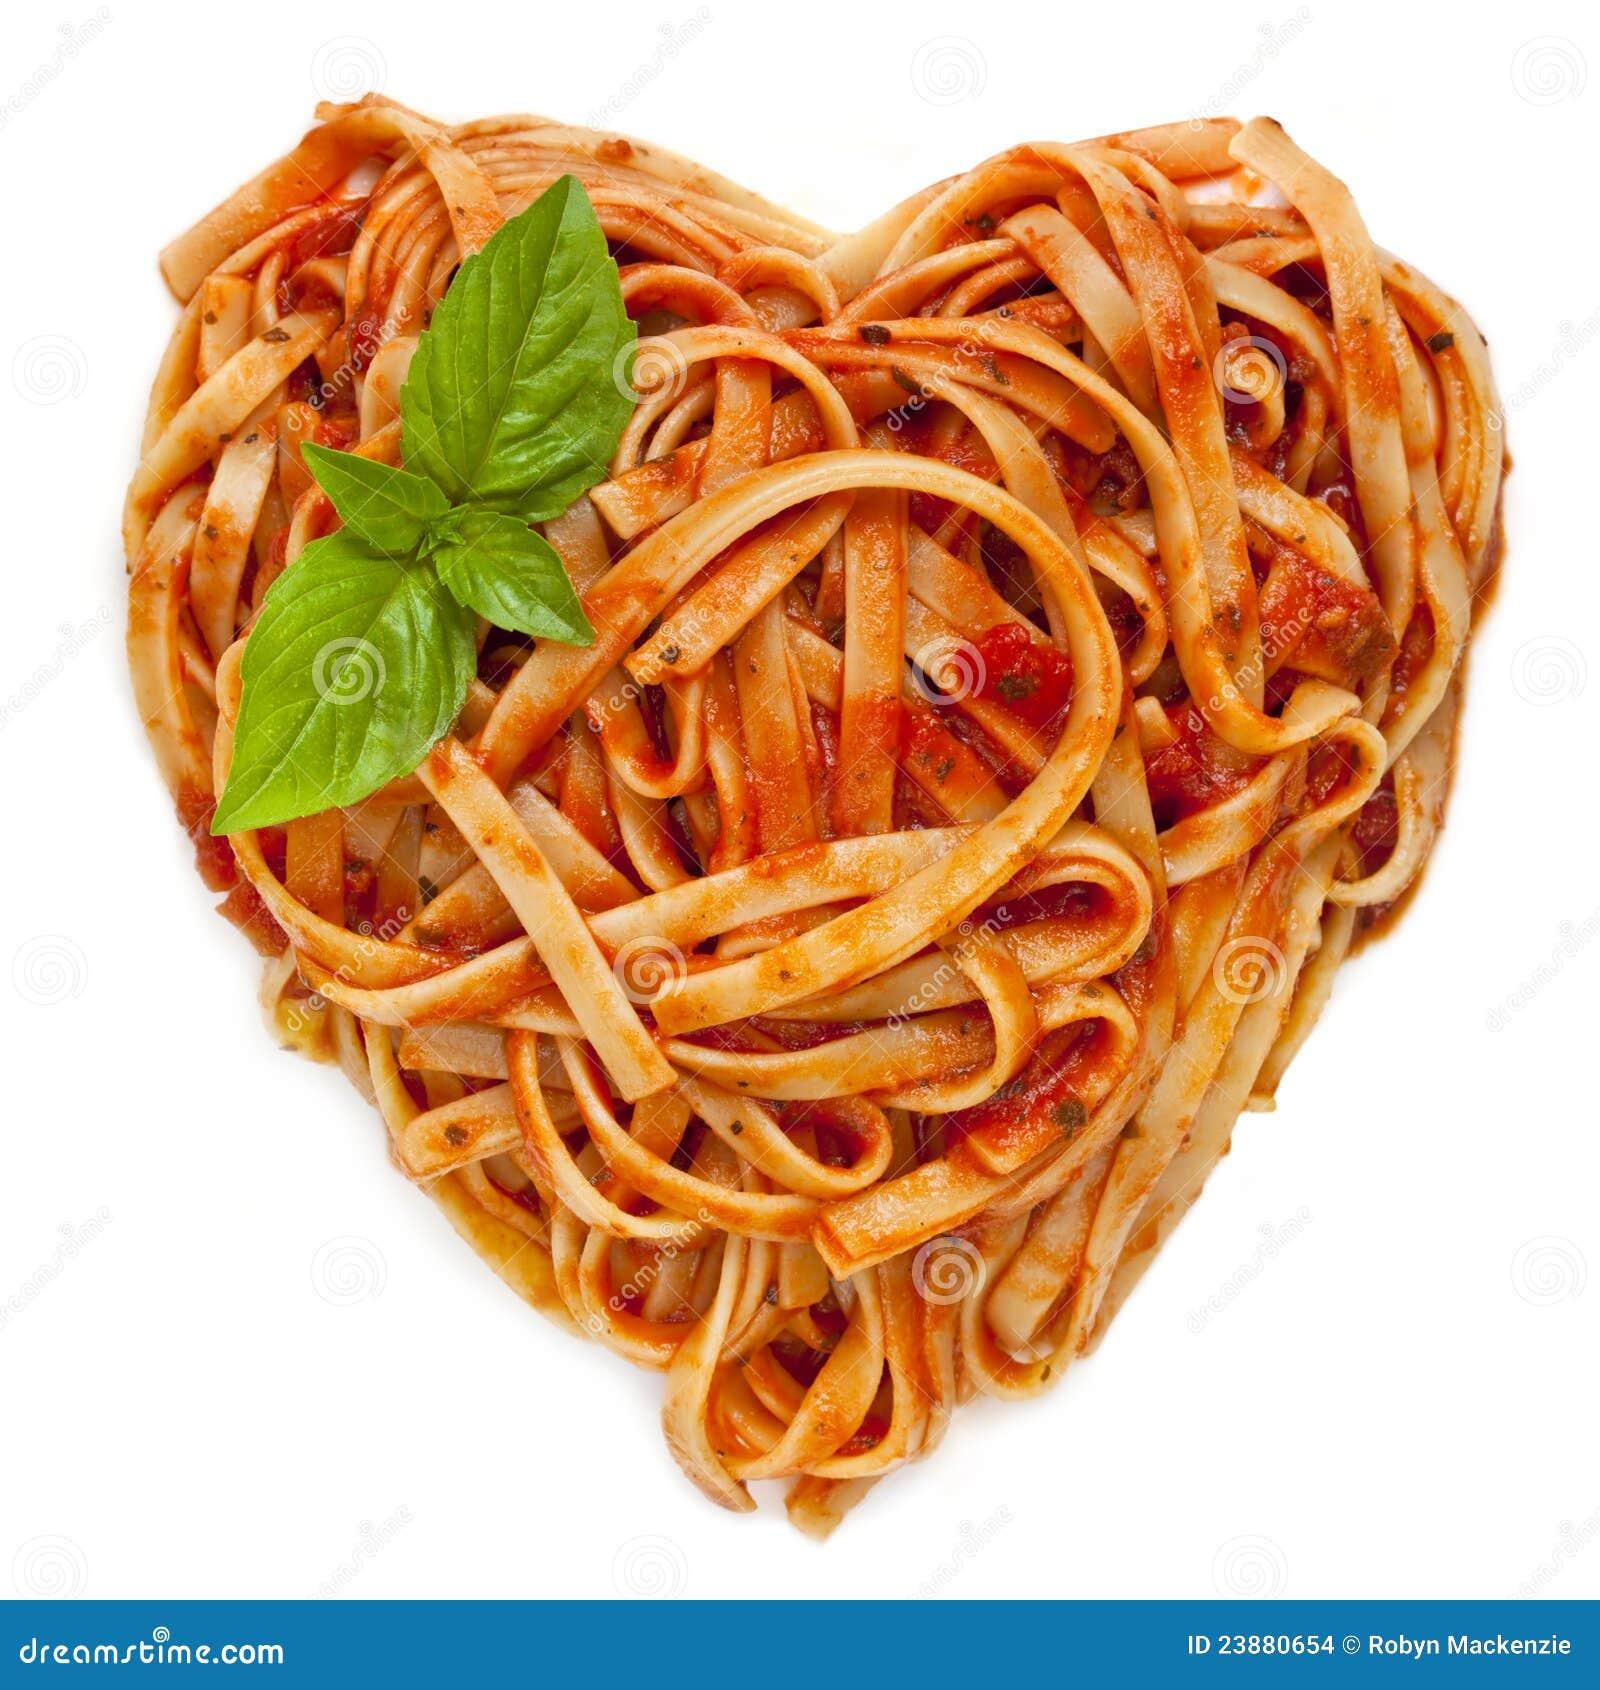 forme-de-coeur-de-spaghetti-avec-le-basilic-23880654